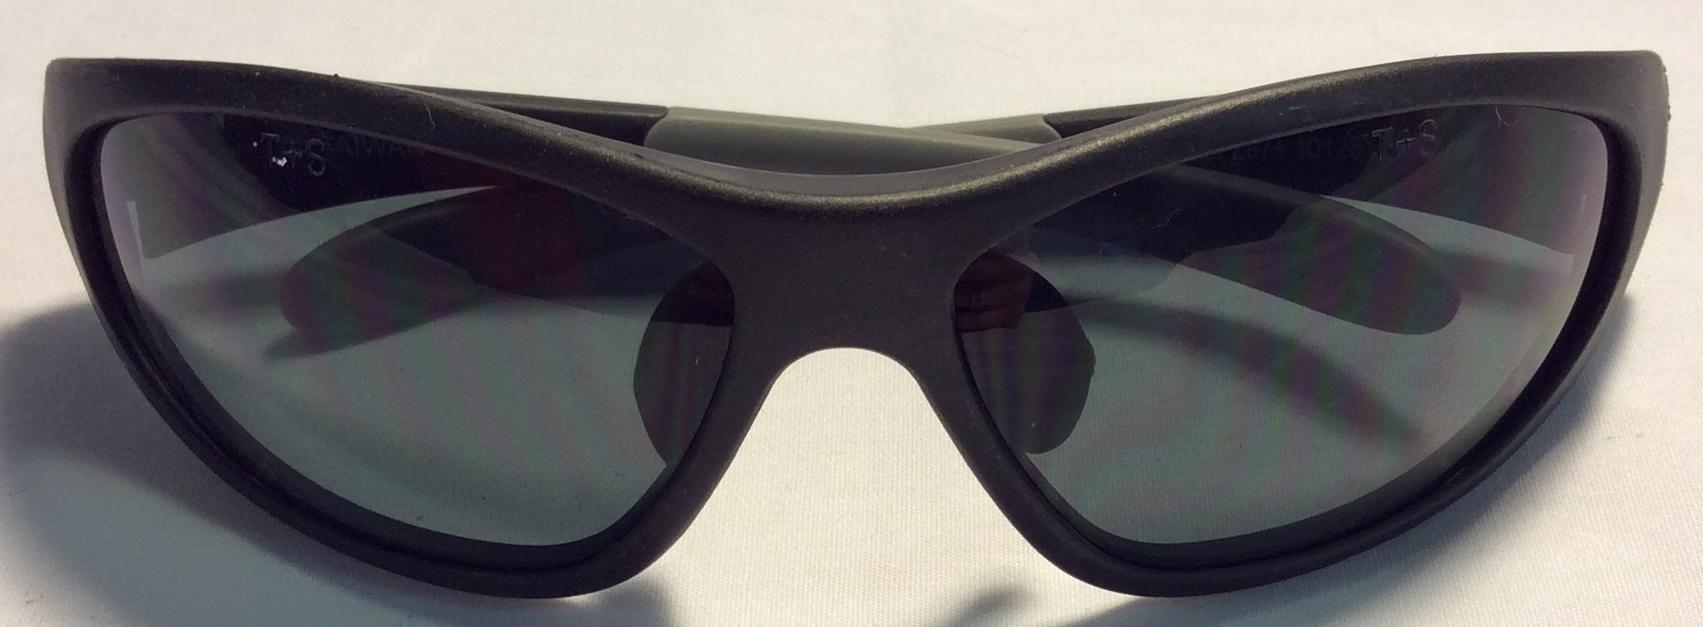 Thick matte black plastic frames